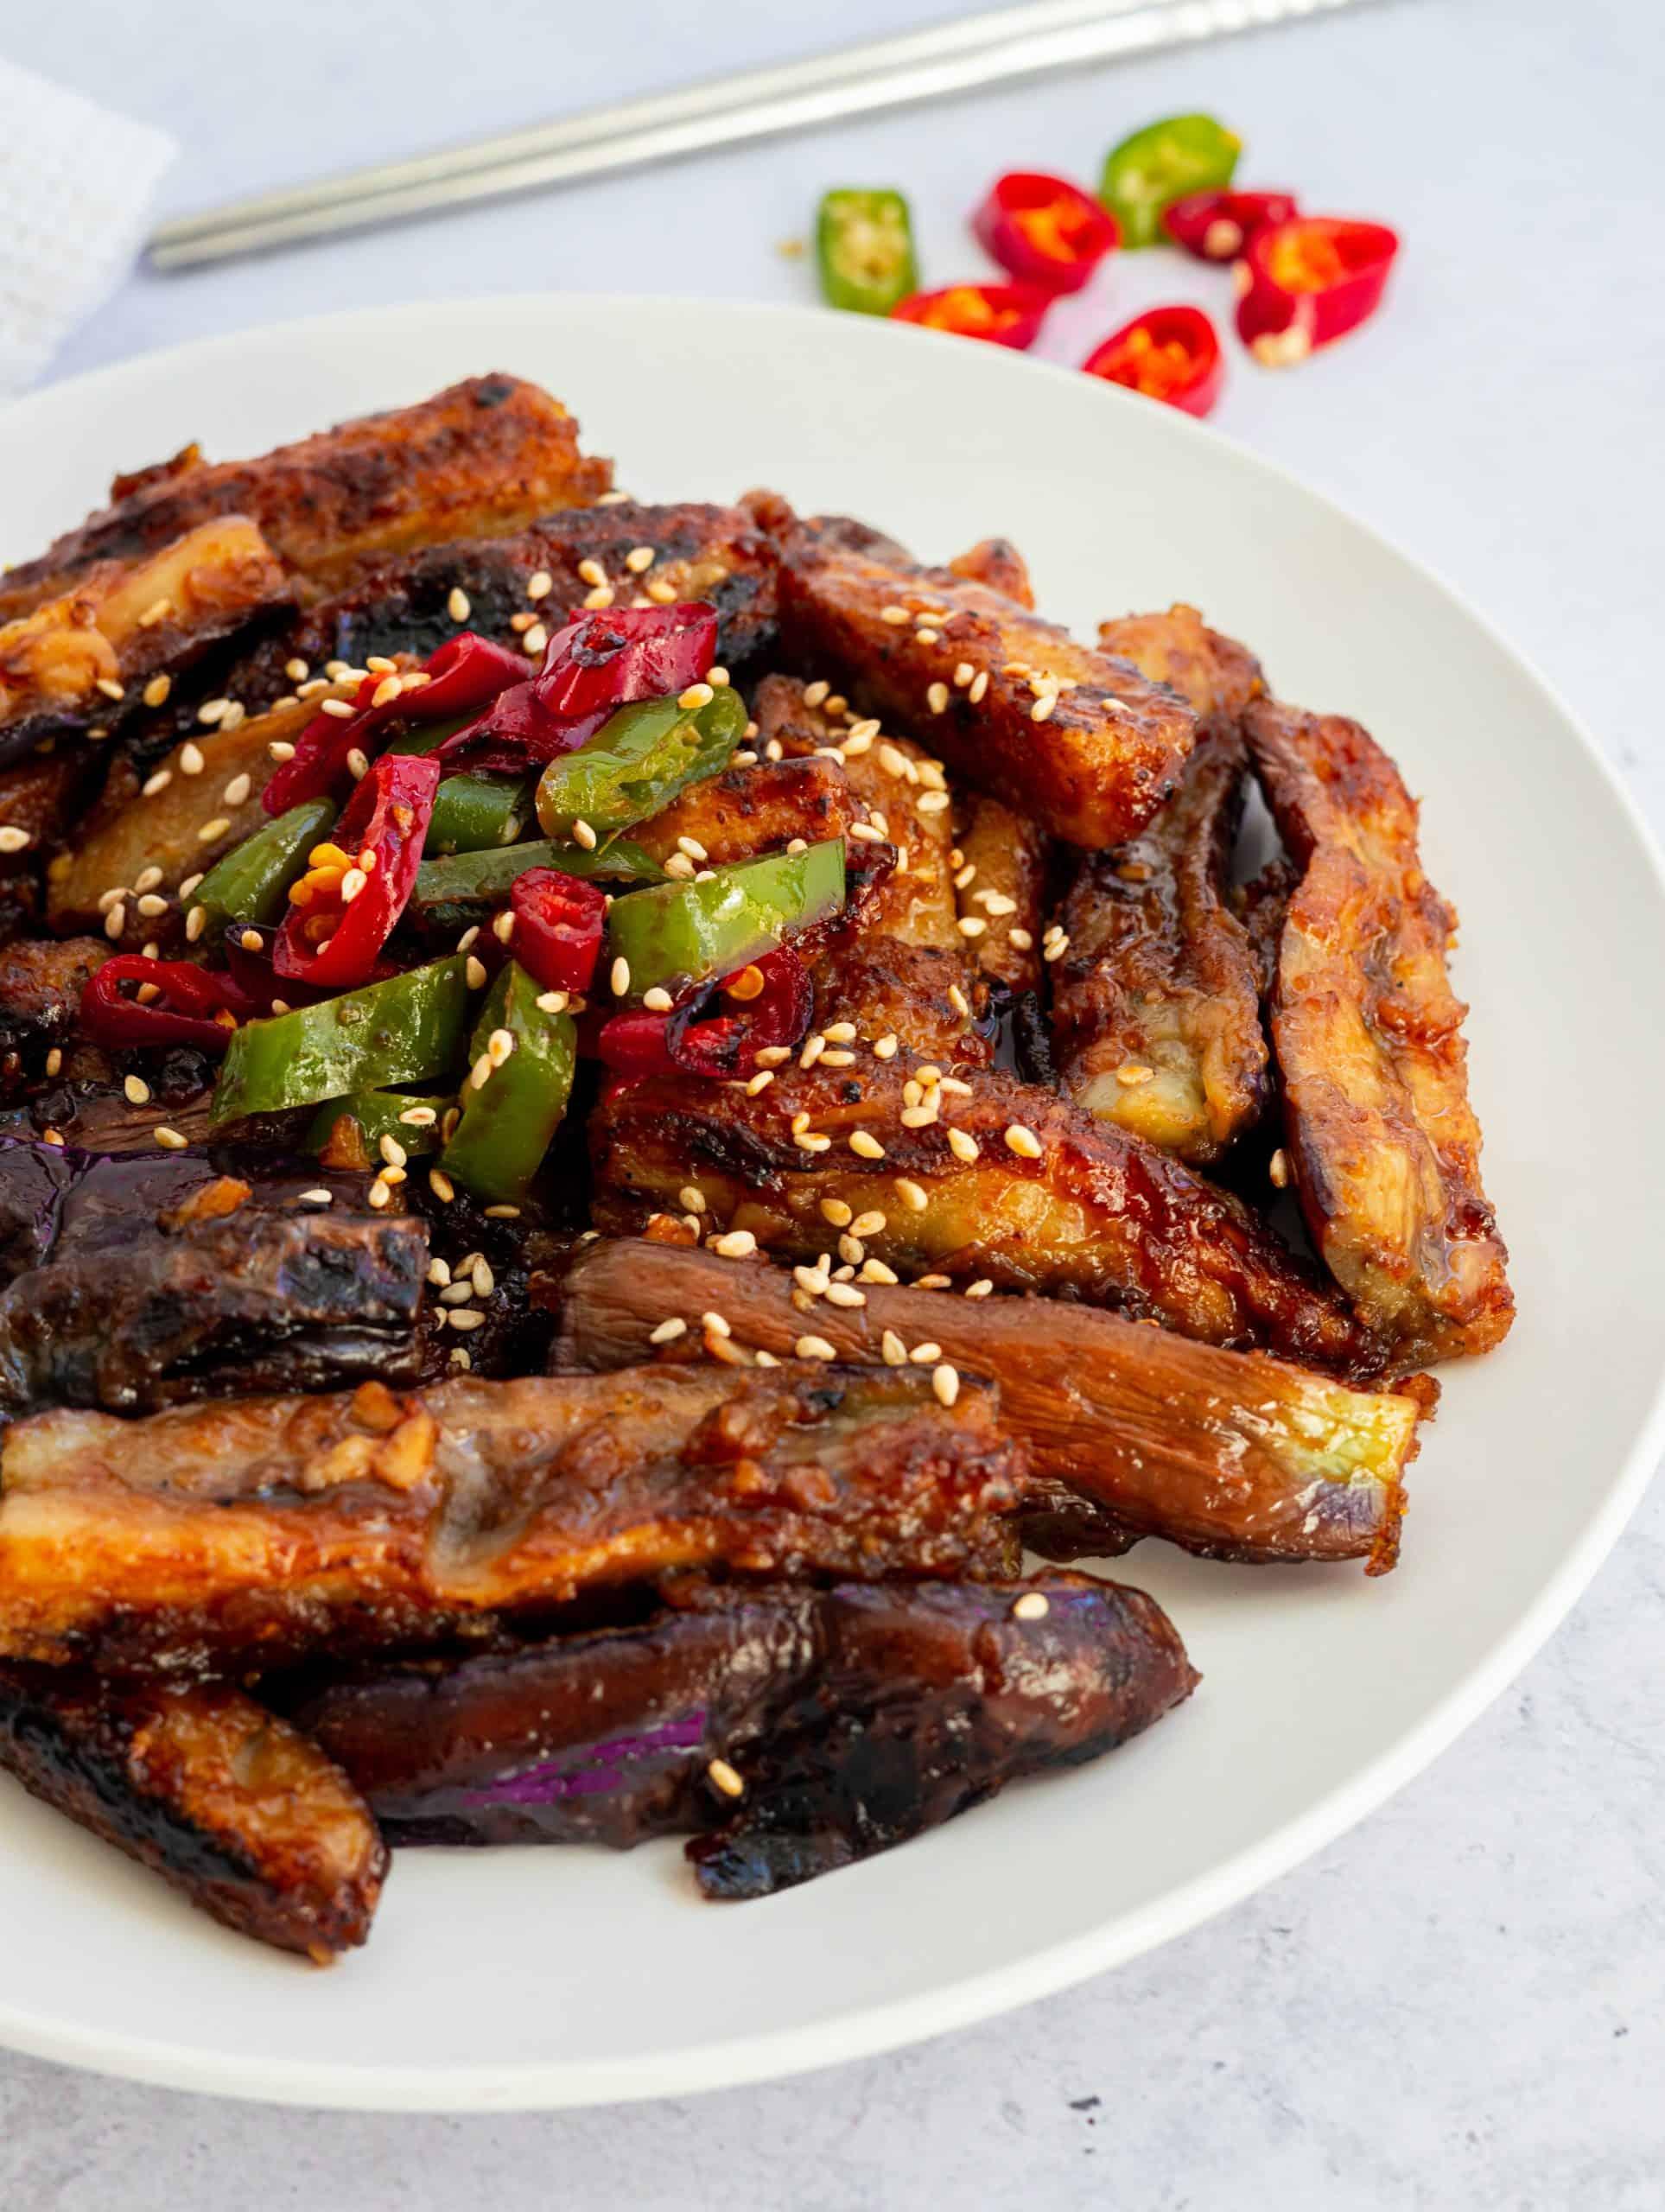 Chinese Hoisin Eggplant stir-fry